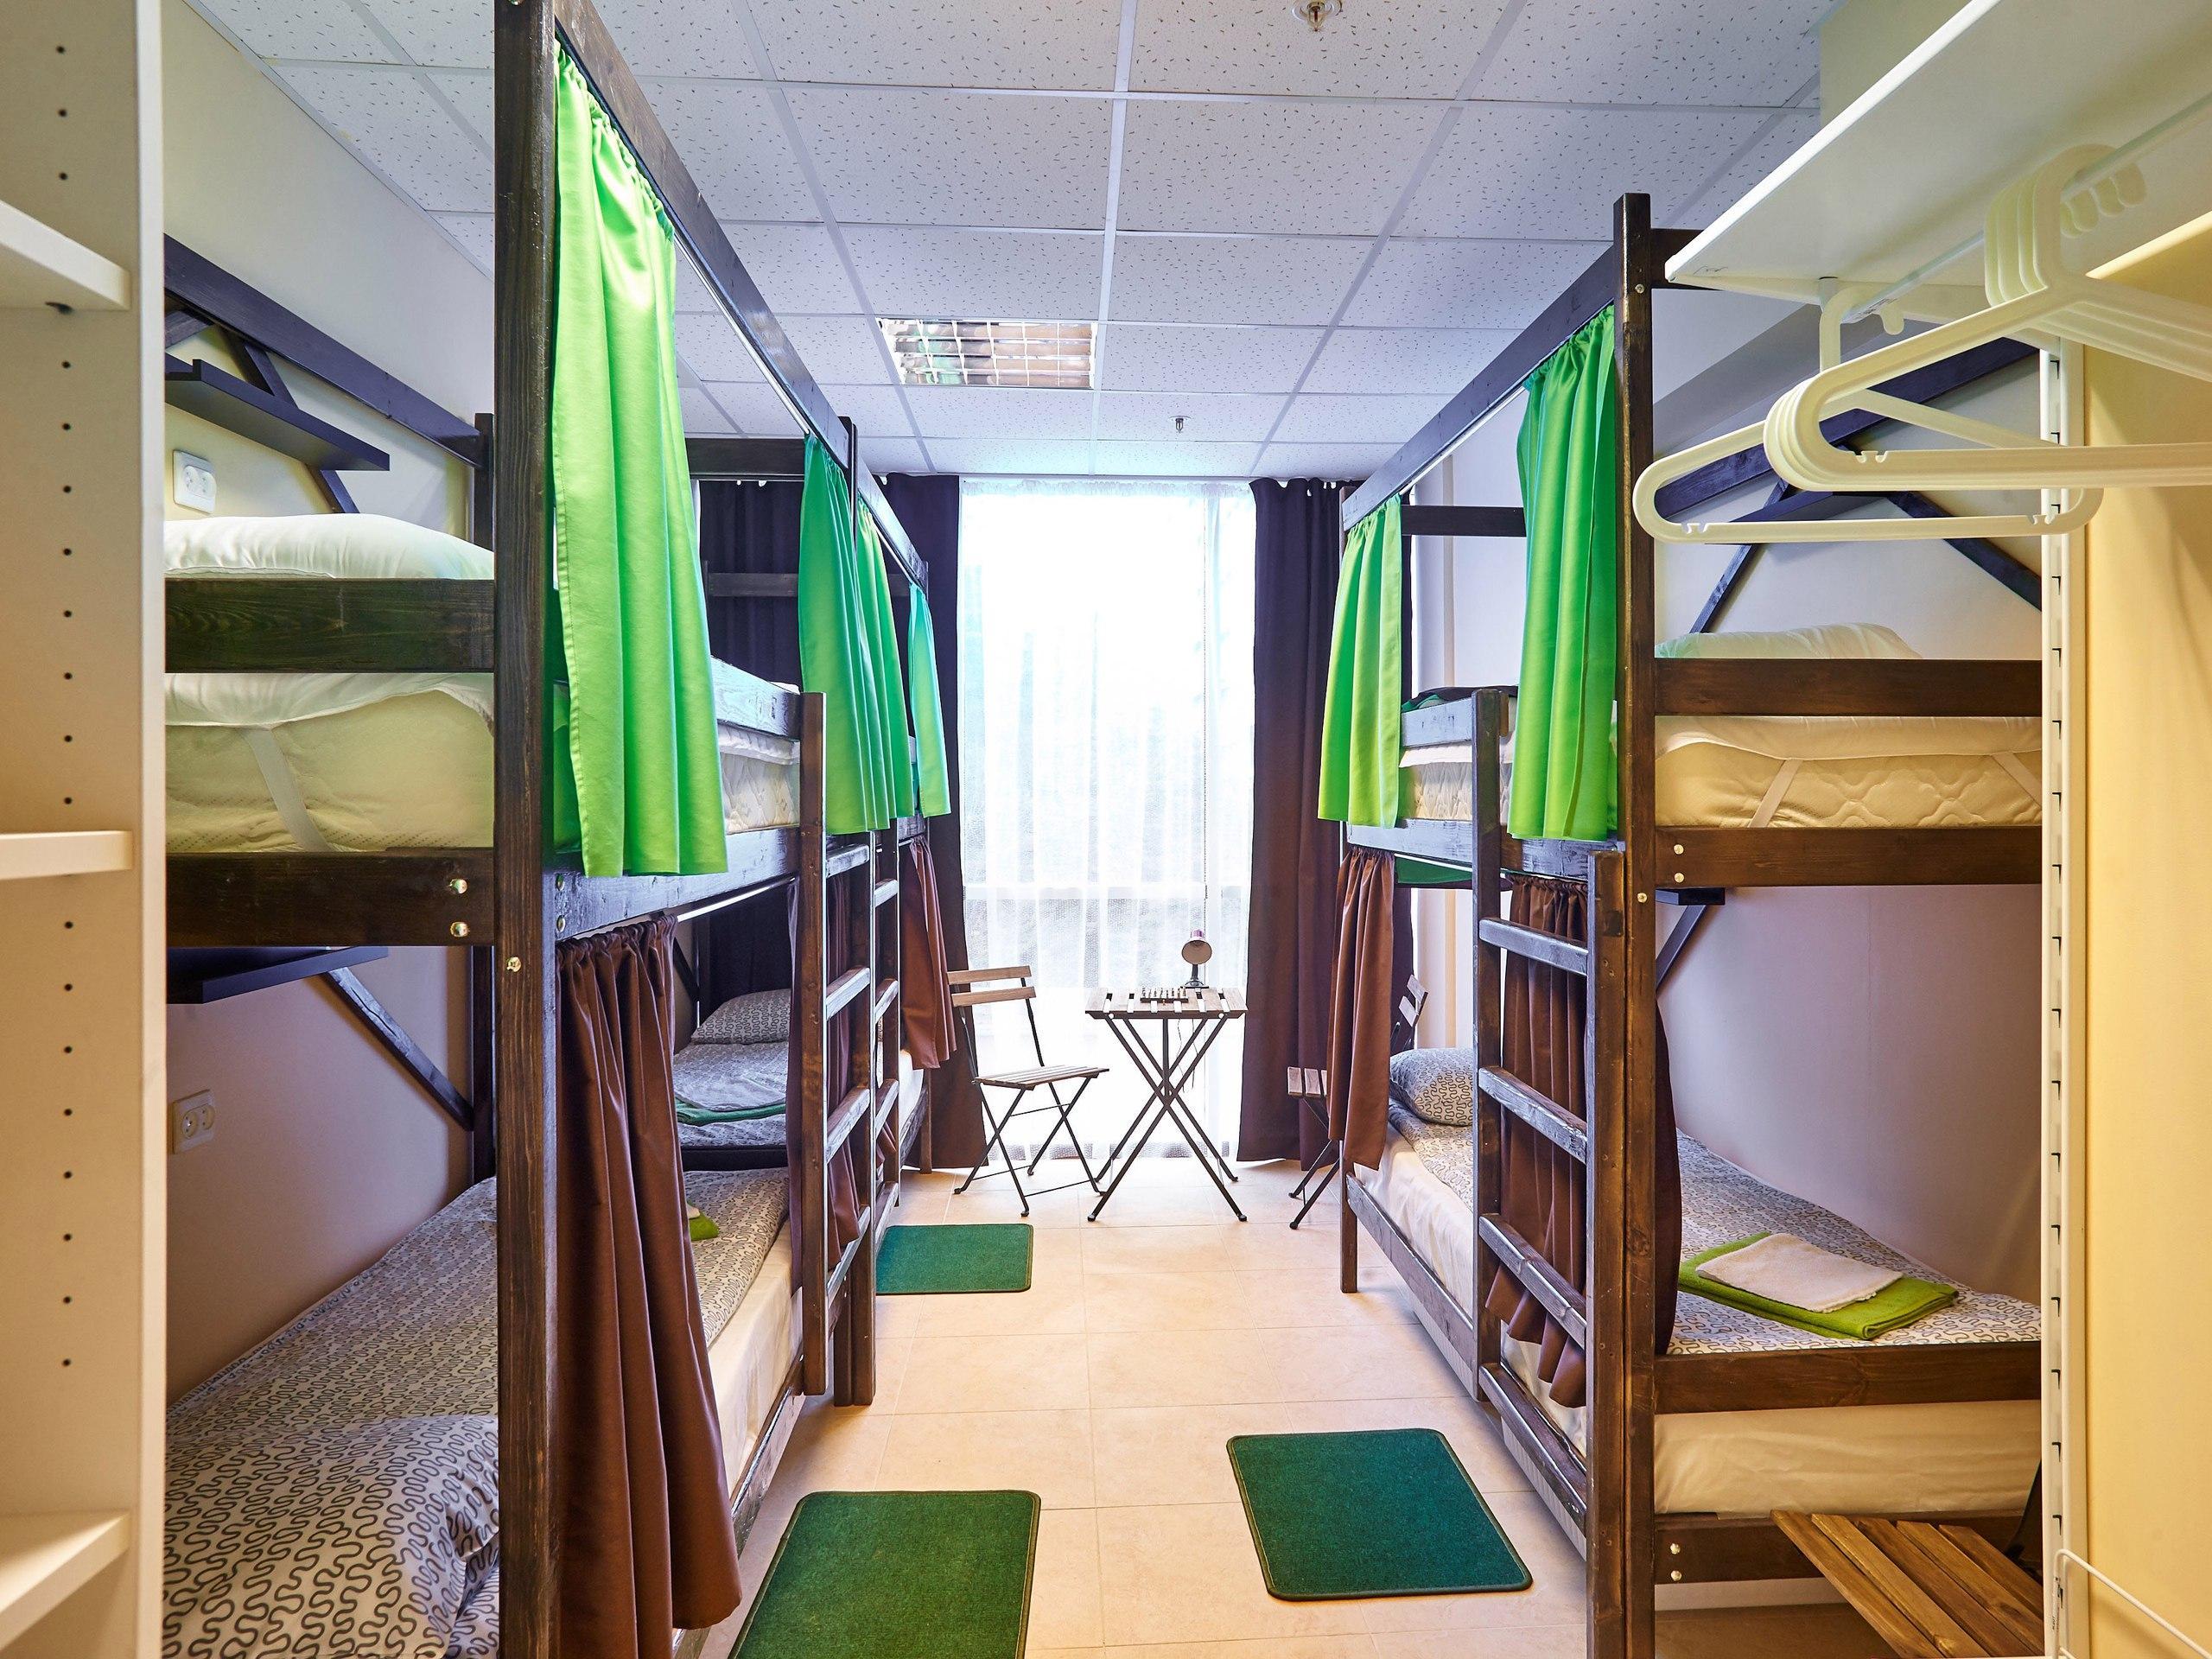 Хостел на Навагинской - image SWCtuUKZFwc on http://bizneskvartal.ru